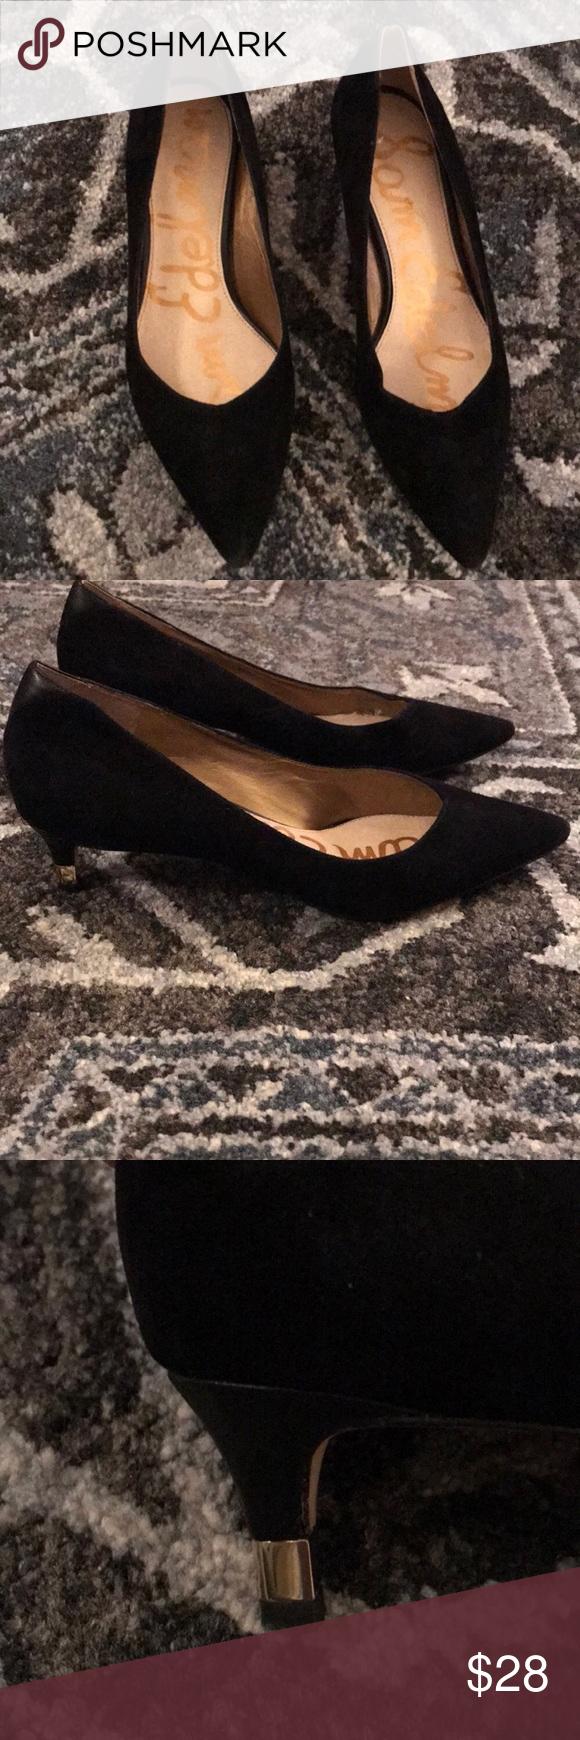 46da2dd93145 Sam Edelman Dori Pump size 7 Sam Edelman Dori Pump black suede. Size 7 and  in great condition as the shoe was ever only worn once. Heel style is Kitten  Heel ...